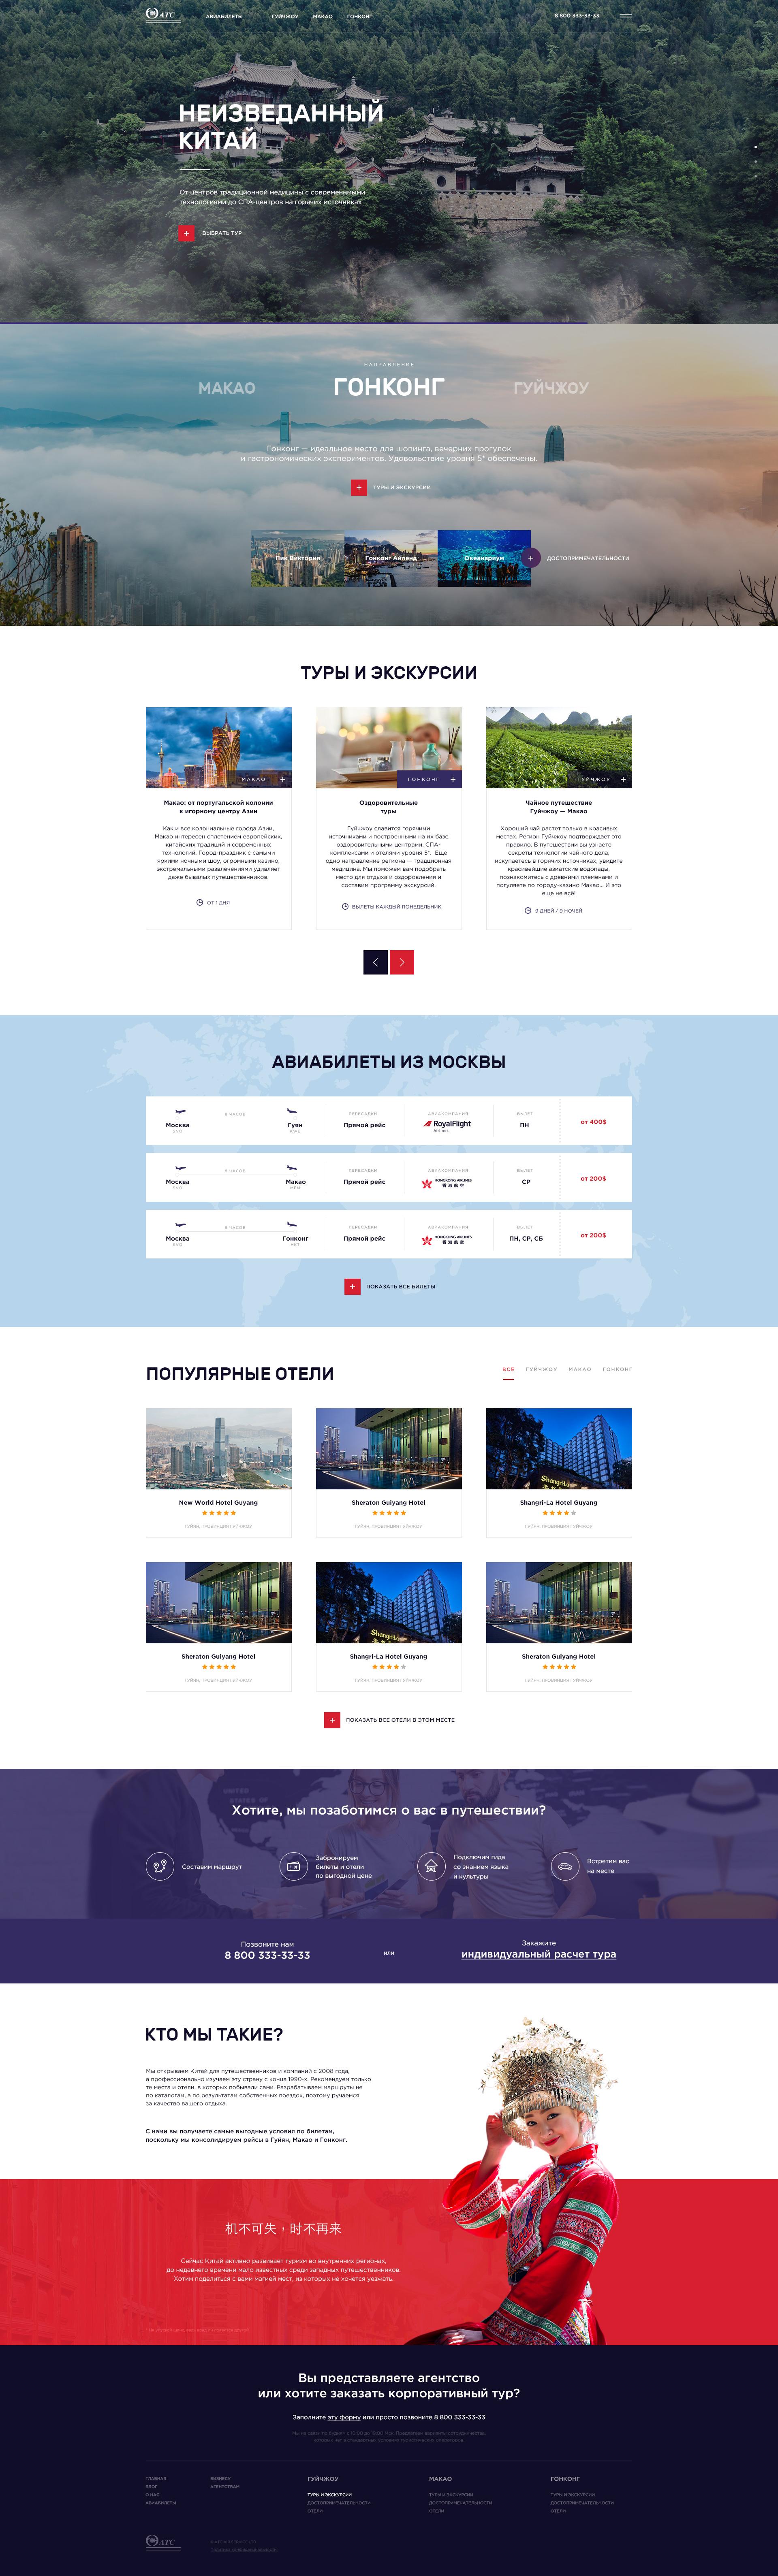 Сайт о турах в Китай